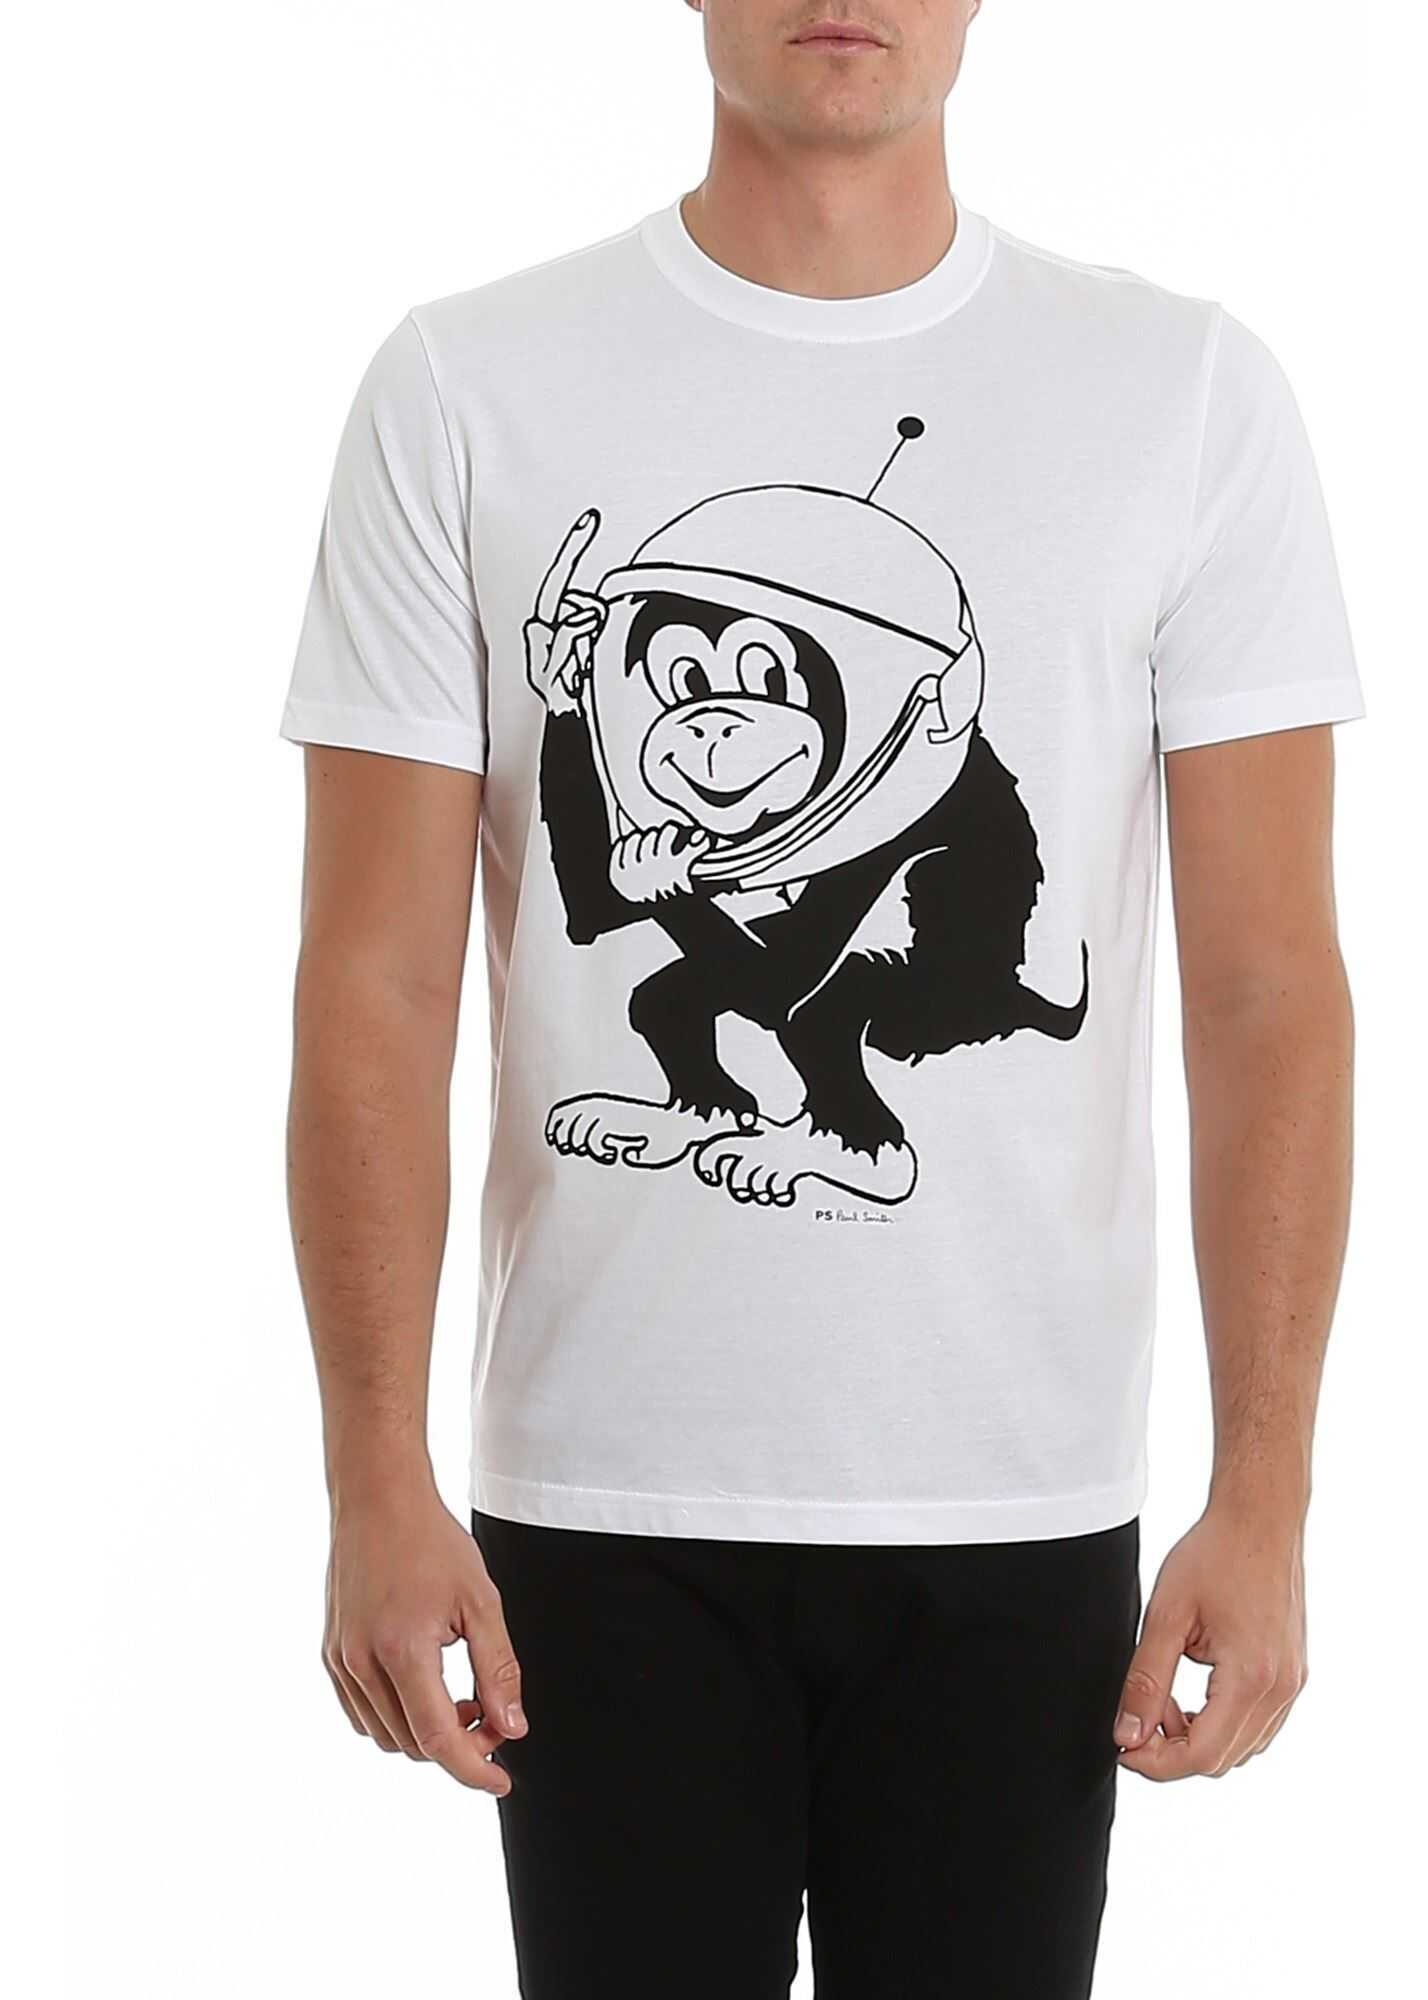 Paul Smith Space Monkey Print T-Shirt In White White